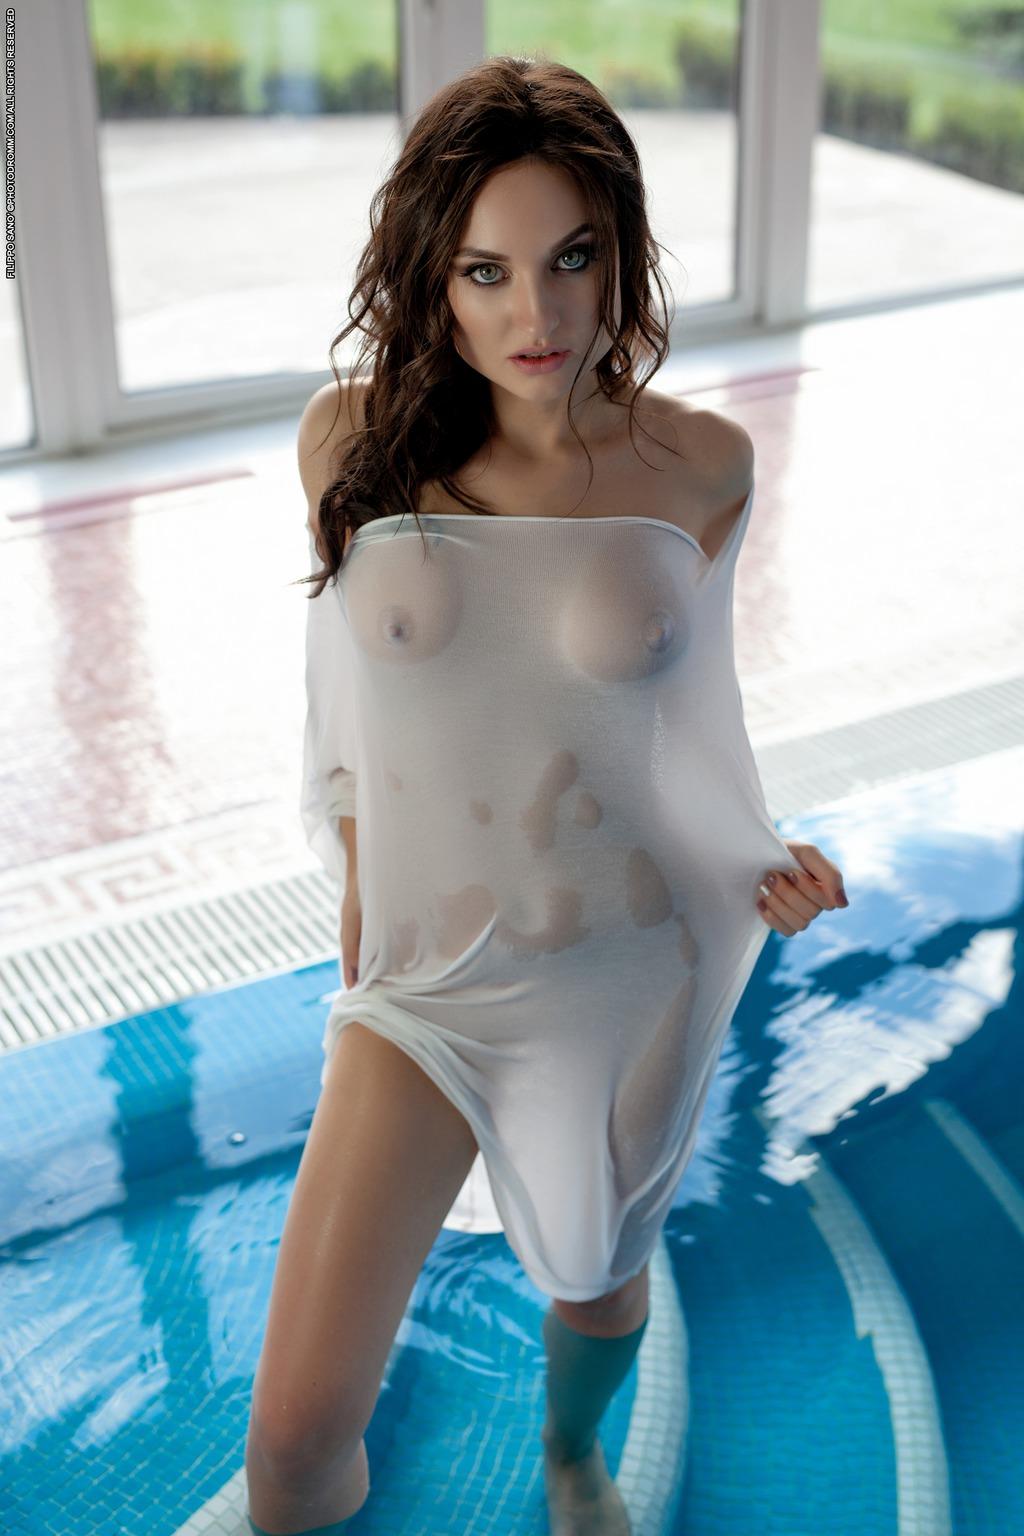 PHOTO | Melanie 00 - Melanie In The Shape Of Water